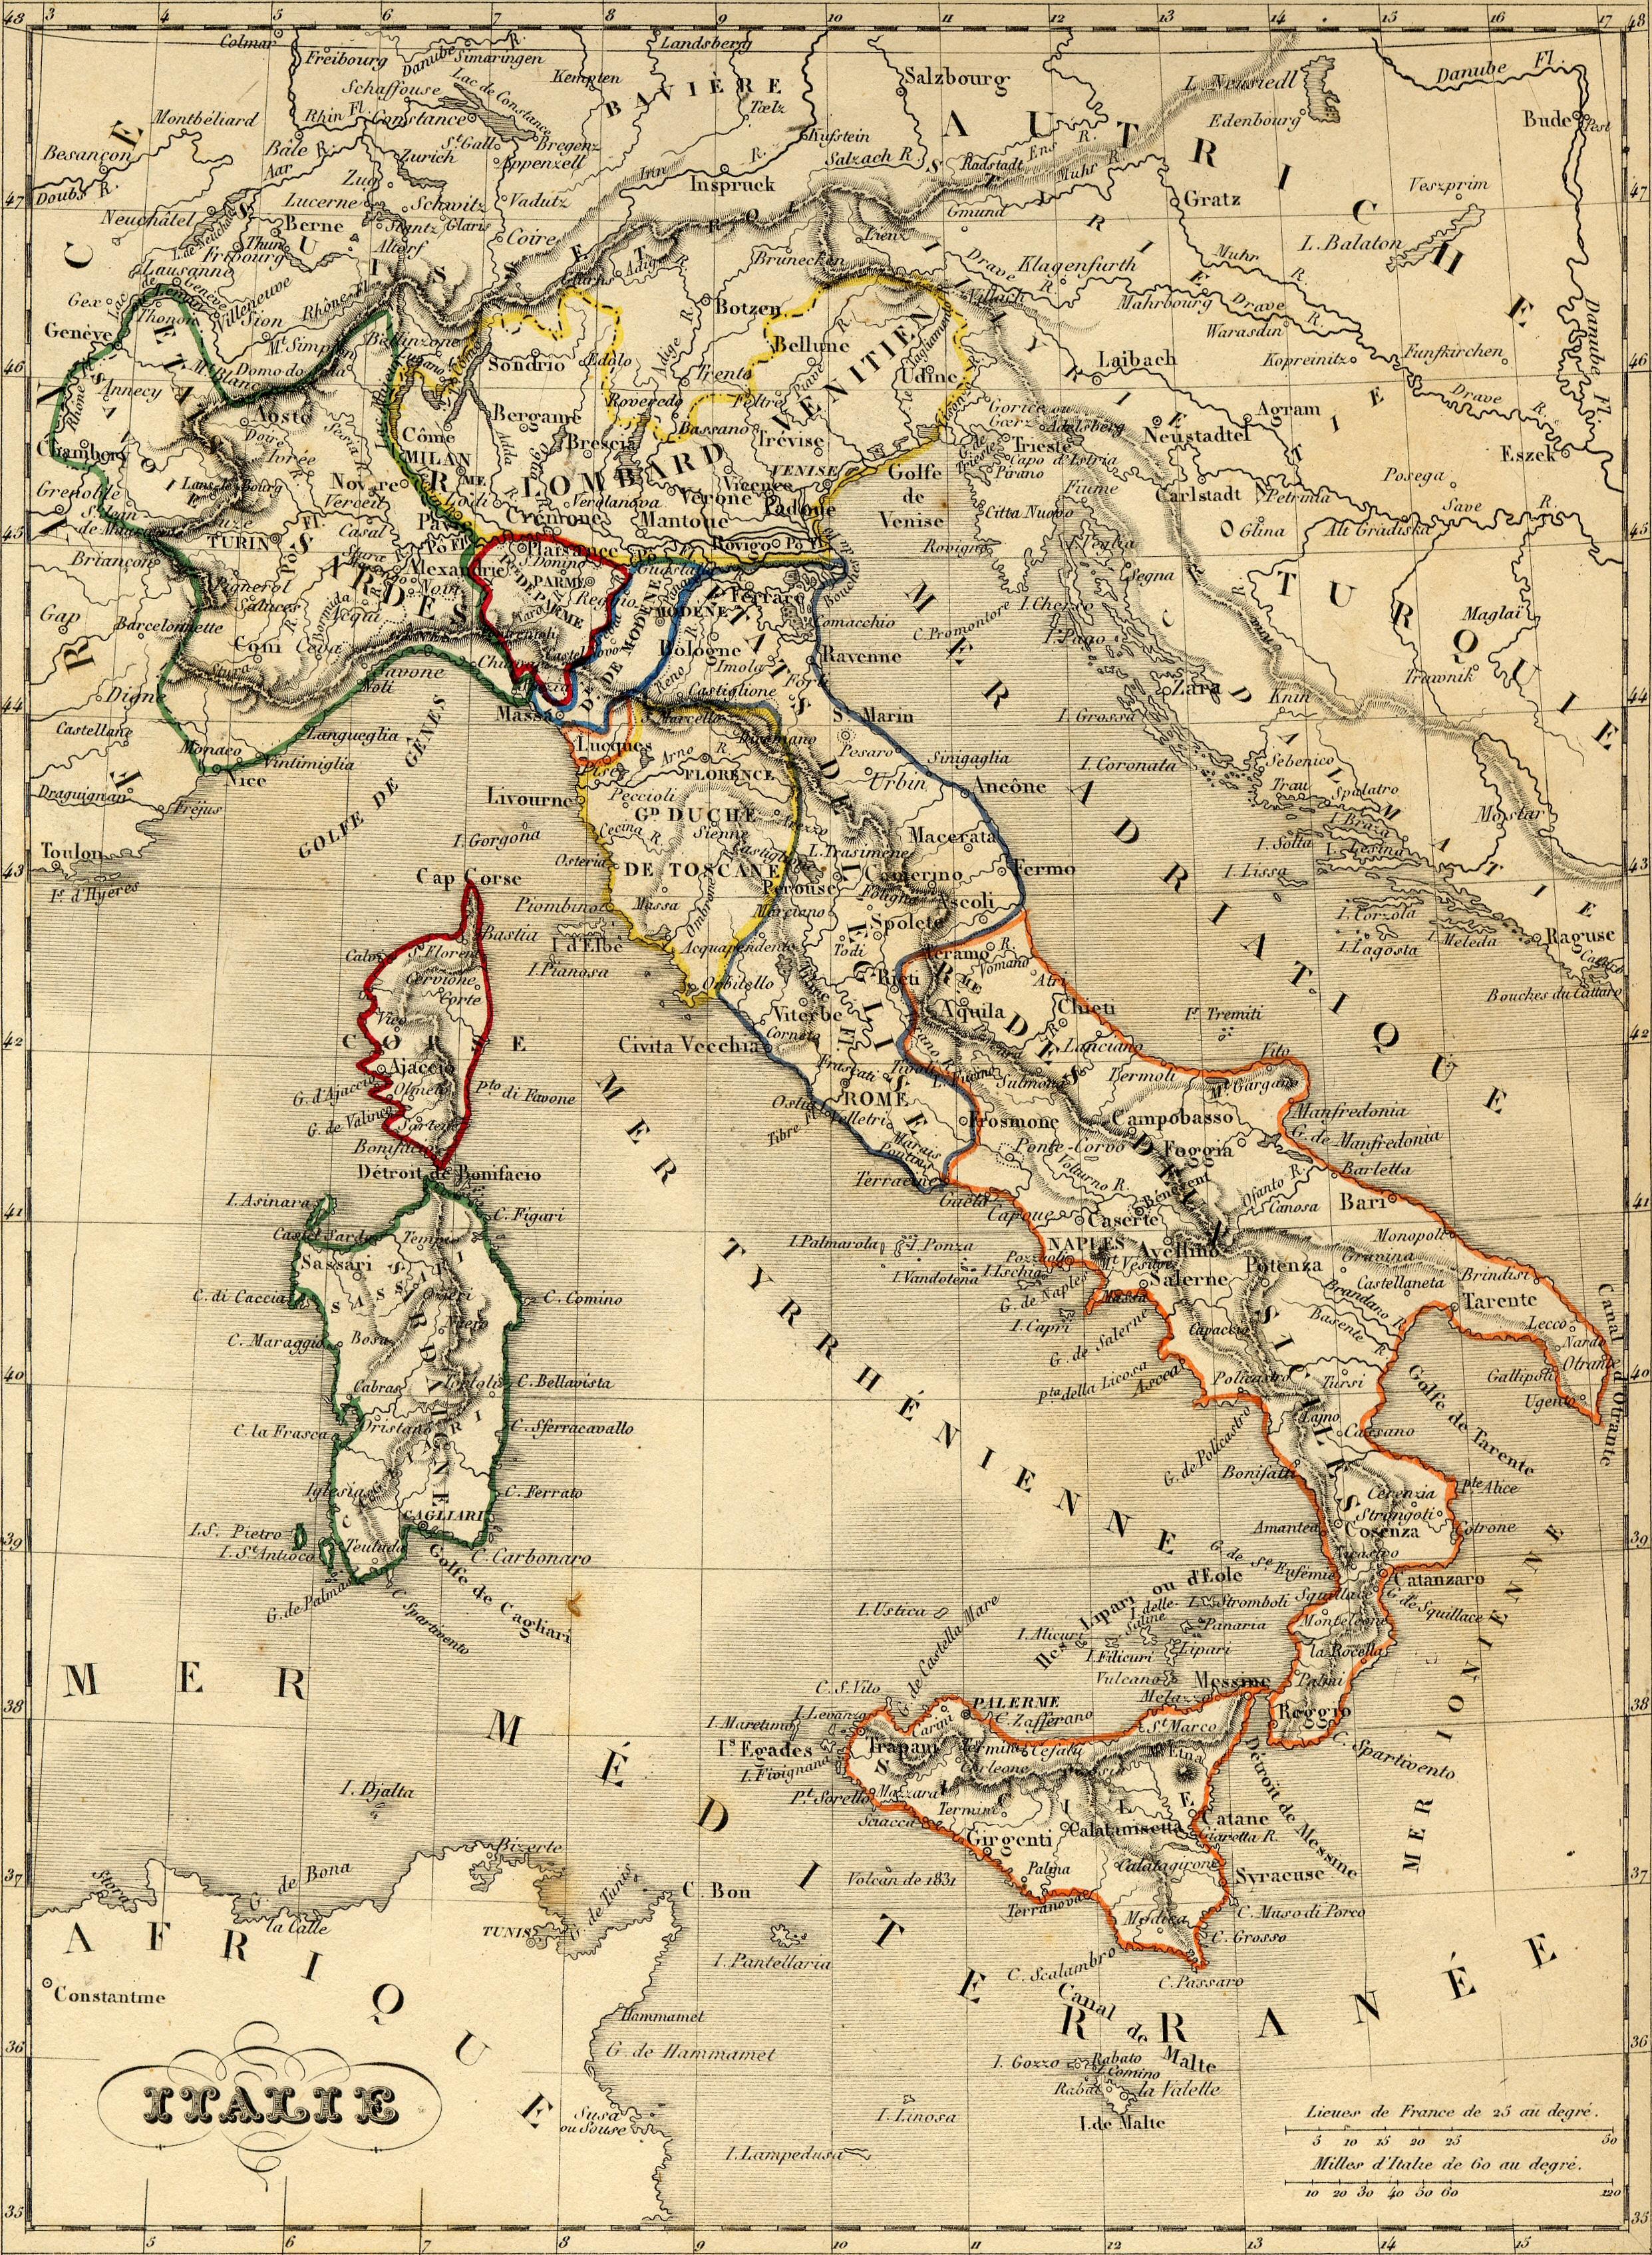 File:Carte italie 1843.jpg - Wikimedia Commons